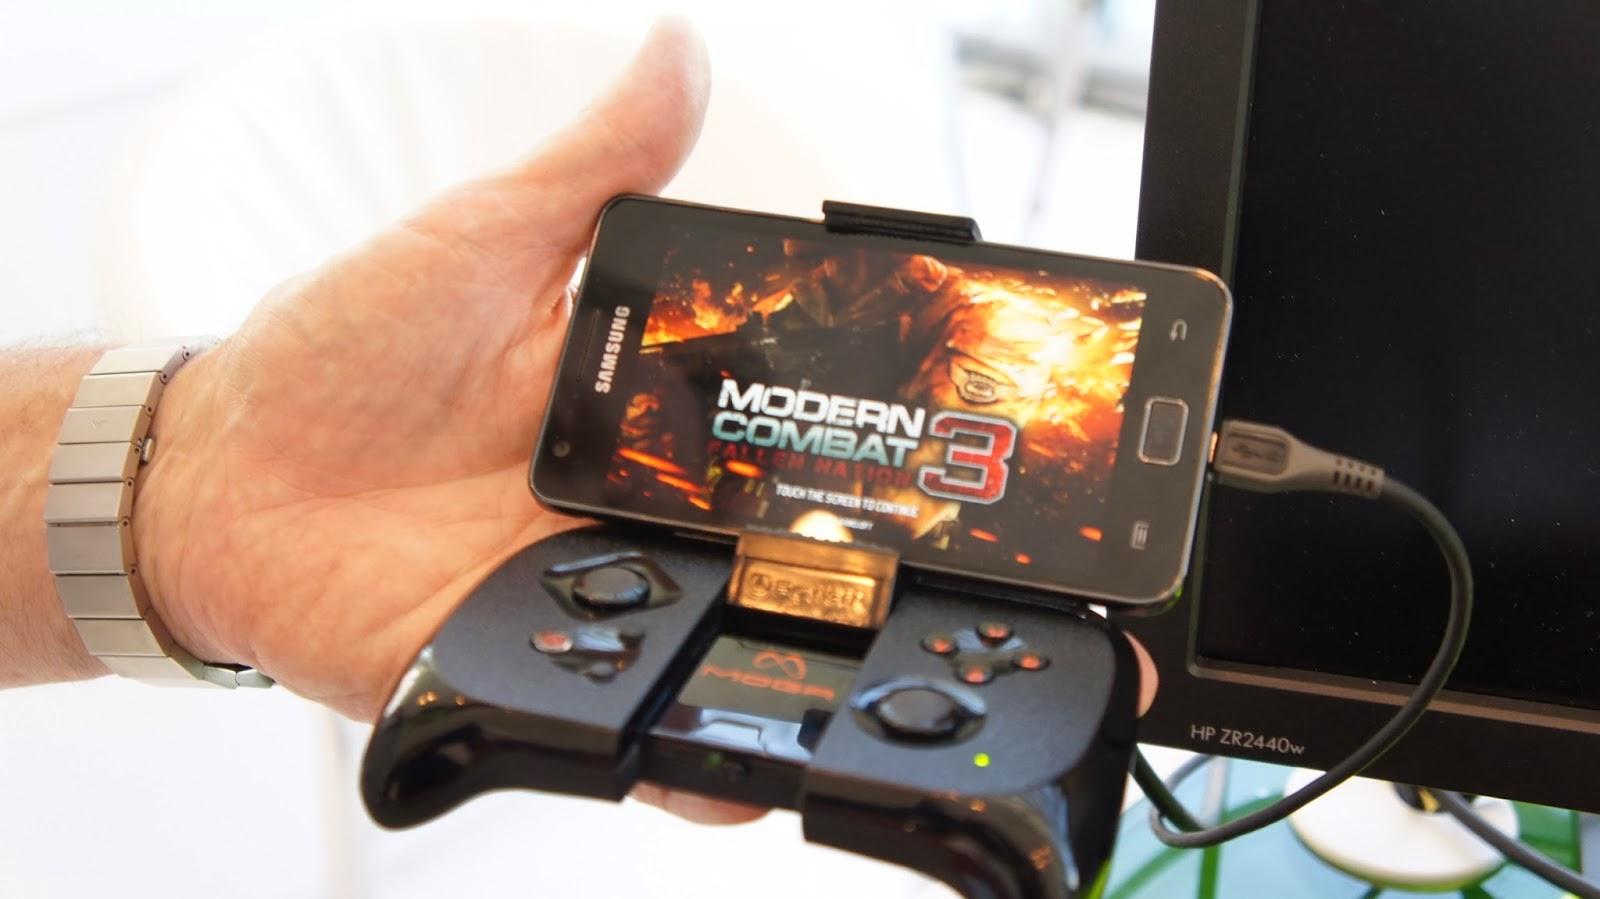 Cara Main Game dengan Stick PS3 pada Smartphone<a href='http://perilian.blogspot.com/2013/11/tips-dan-trik-android-terbaru.html/'> android</a>